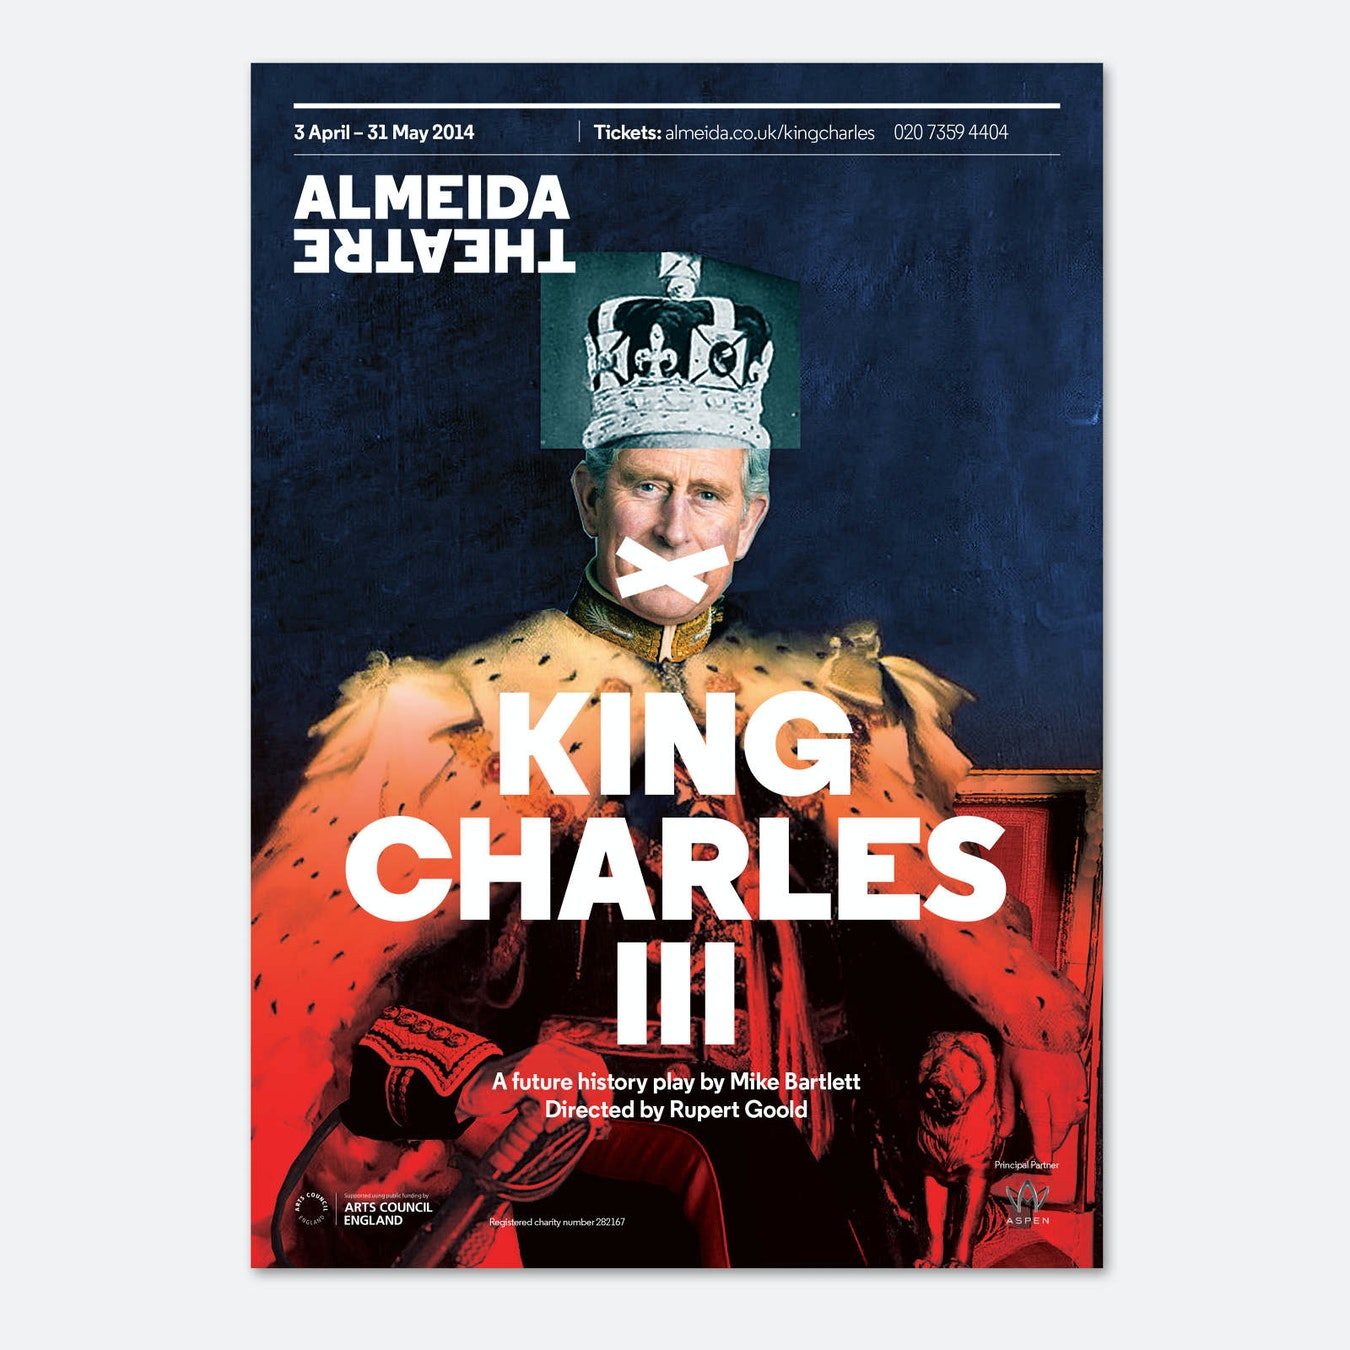 Almeida_Posters_2_1600_c